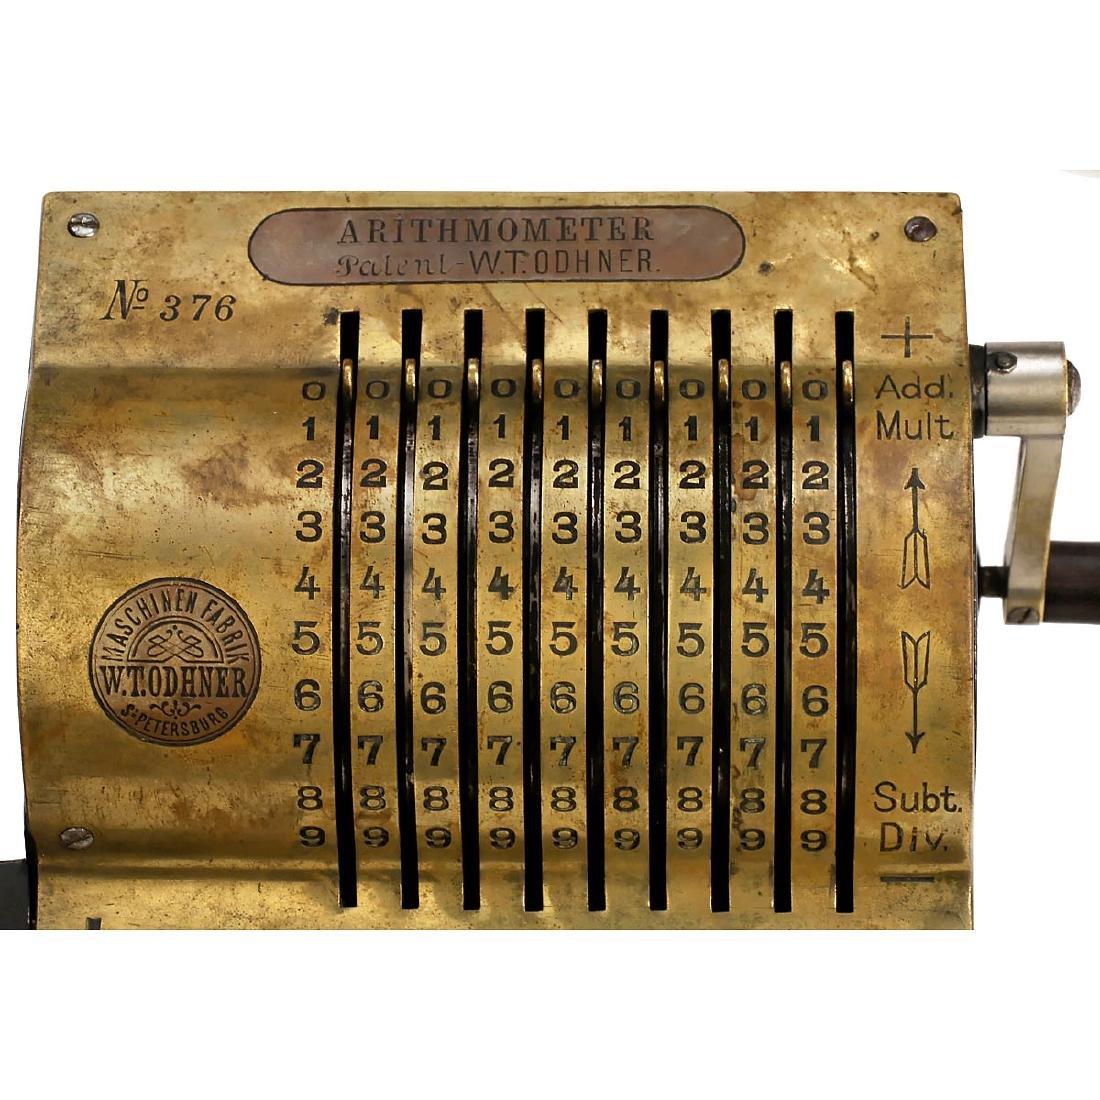 Russian Original Odhner Mod. 1 (Arithmometer), 1886 (!) - 3